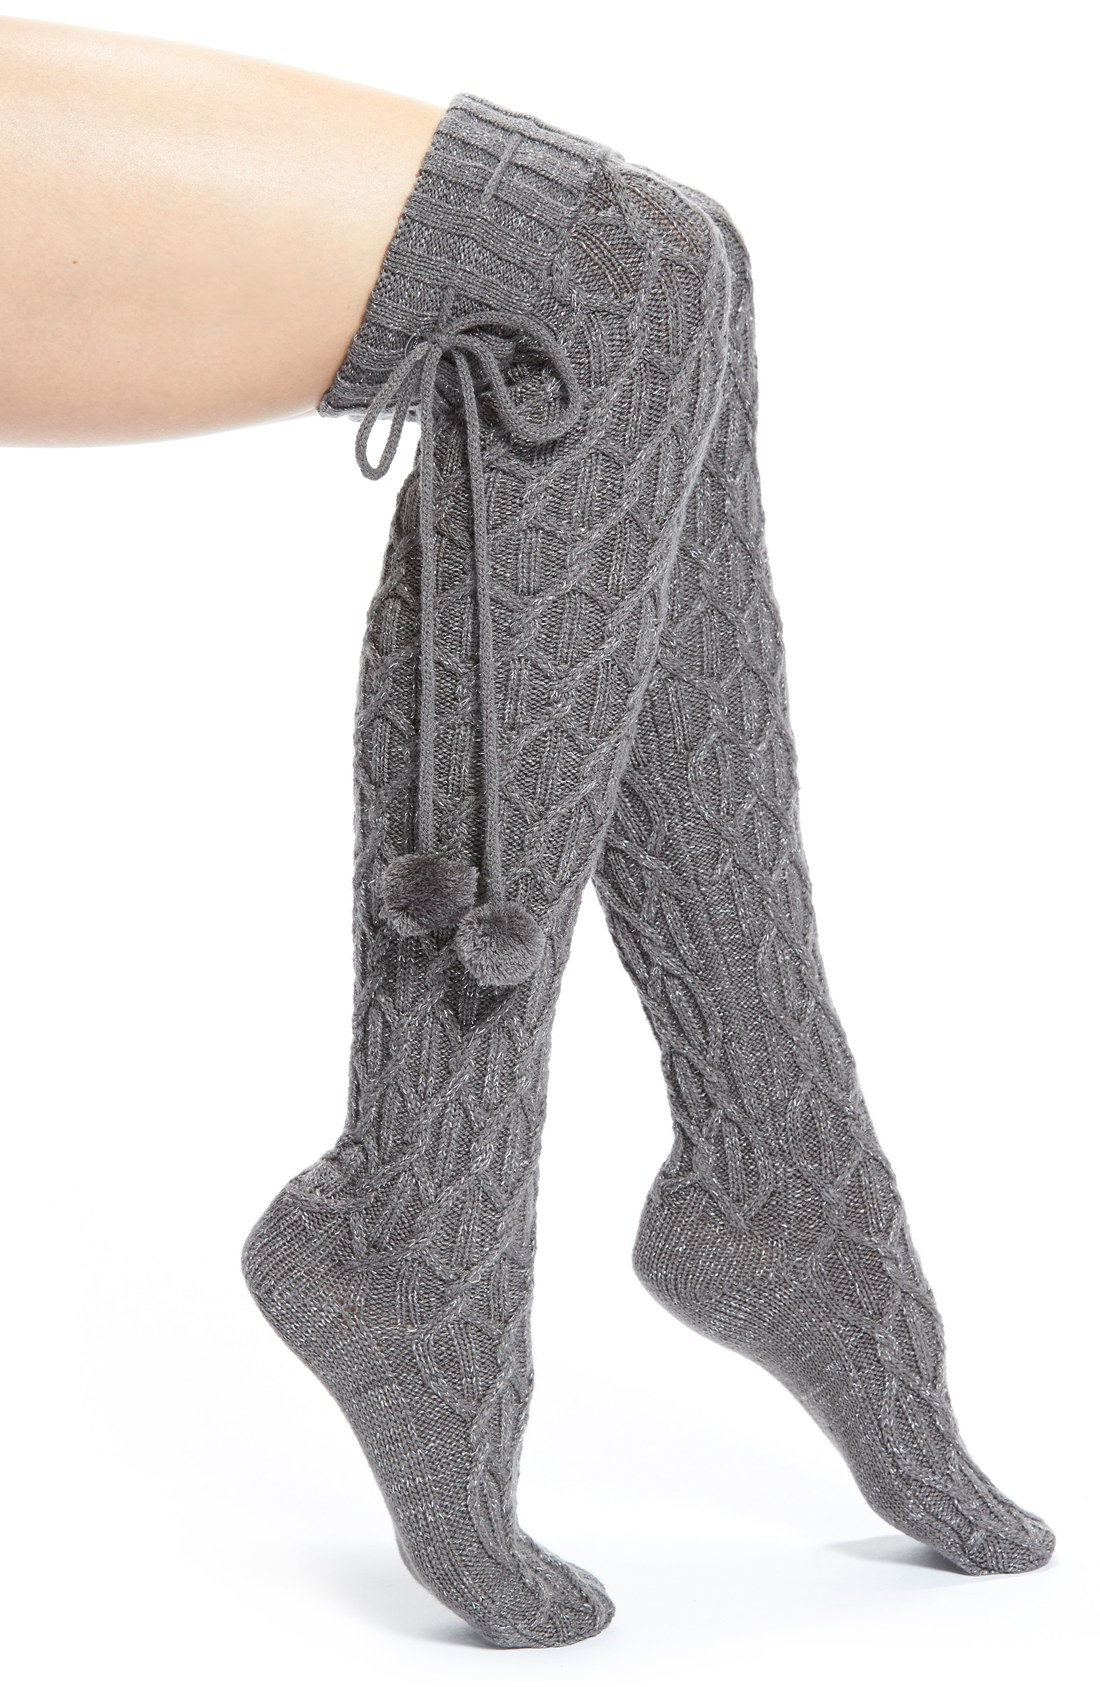 Knitting Pattern For Over The Knee Socks : UGG  Australia Pompom Cable Knit Over the Knee Socks ...